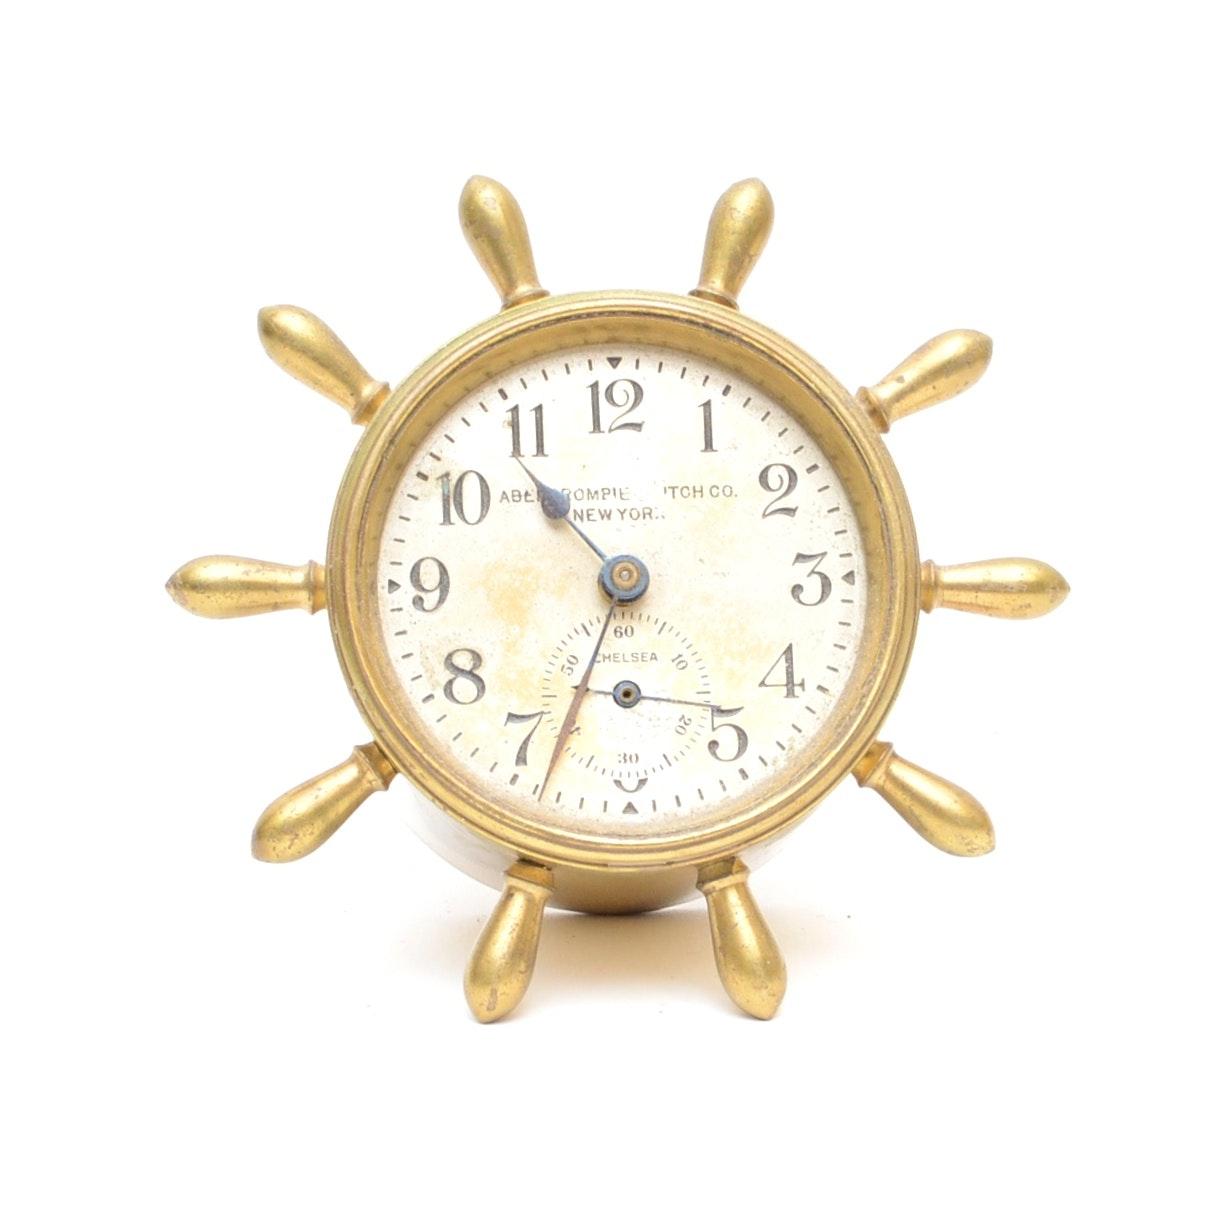 1930's  Abercrombie & Fitch Chelsea Ship's Wheel Desk Clock